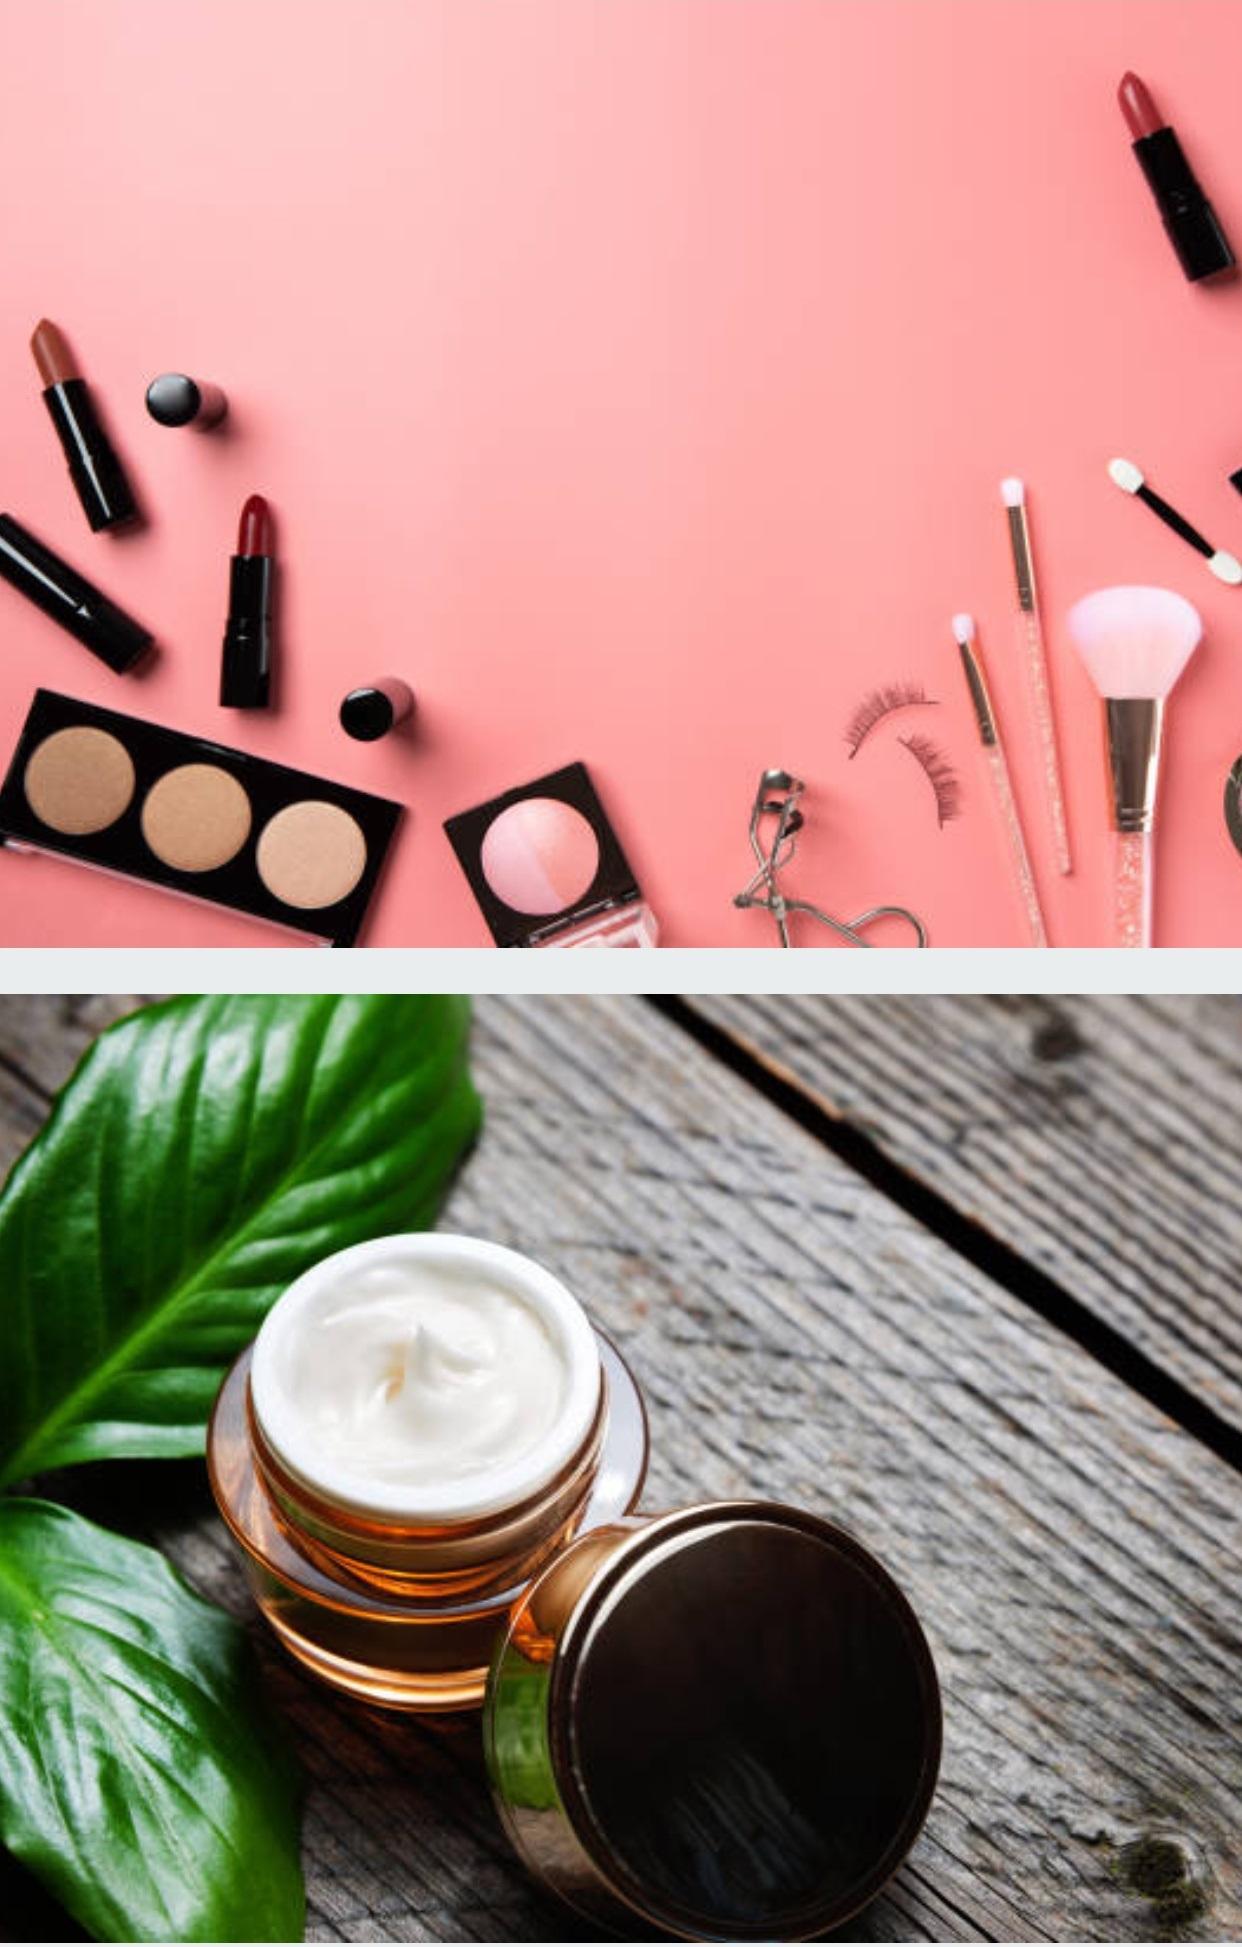 Pircosmetics Newsletter